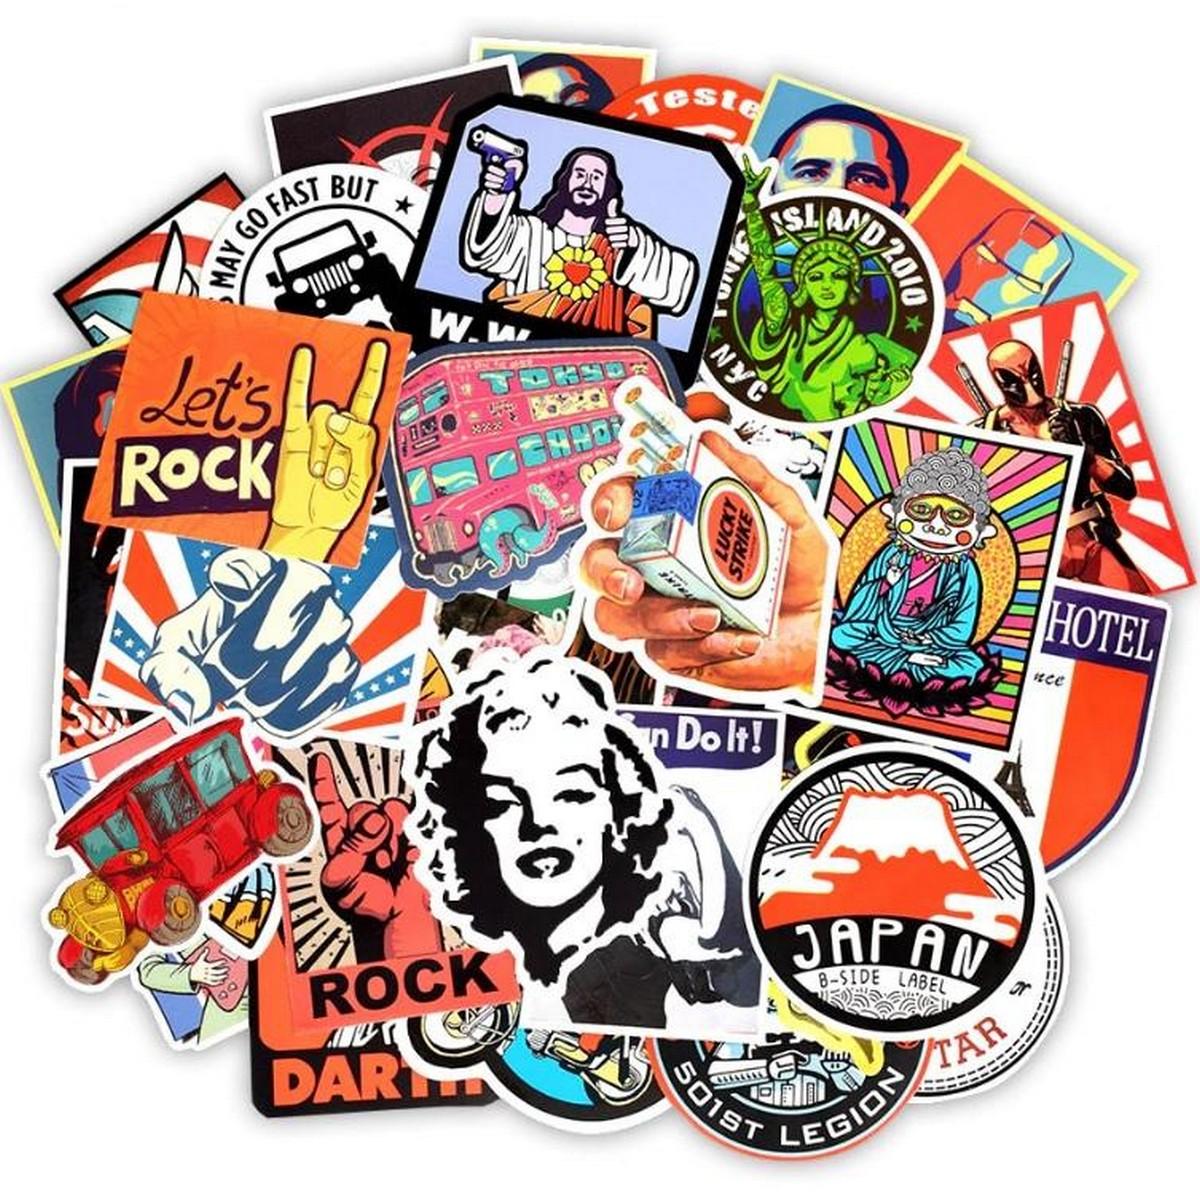 10 Pcs/Pack Retro Style Graffiti Travel Funny Water Proof Stickers for Laptop,Bike,Fridge,TV,Skateboard,Car